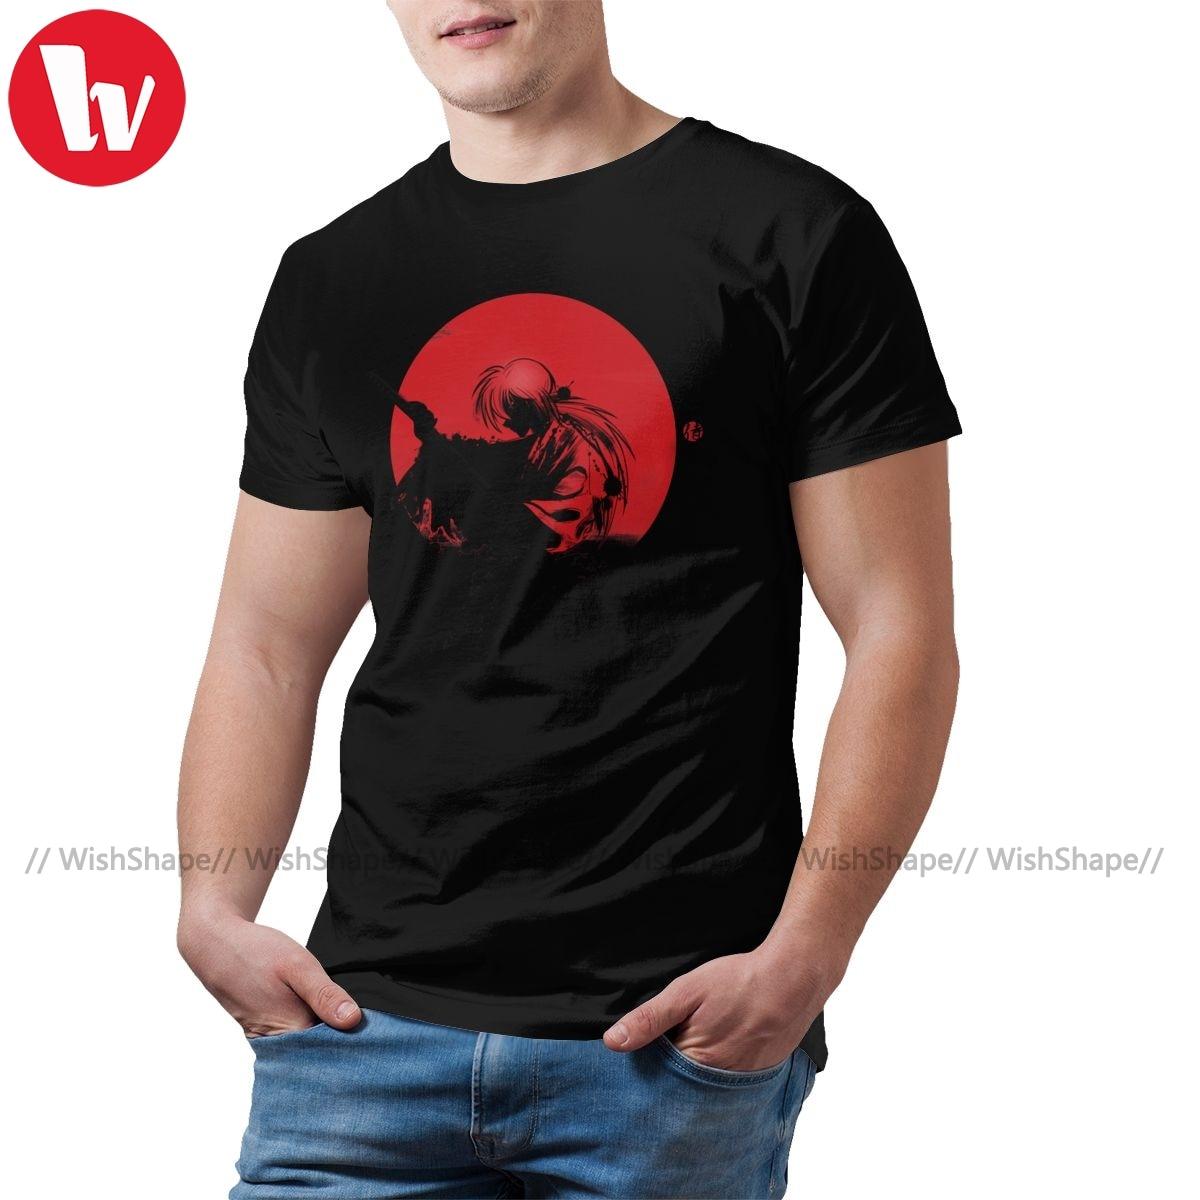 Camiseta Rurouni Kenshin, camiseta roja de Sun Rurouni, camiseta estampada 100 por ciento de algodón, camiseta de playa para hombre, camiseta 5x